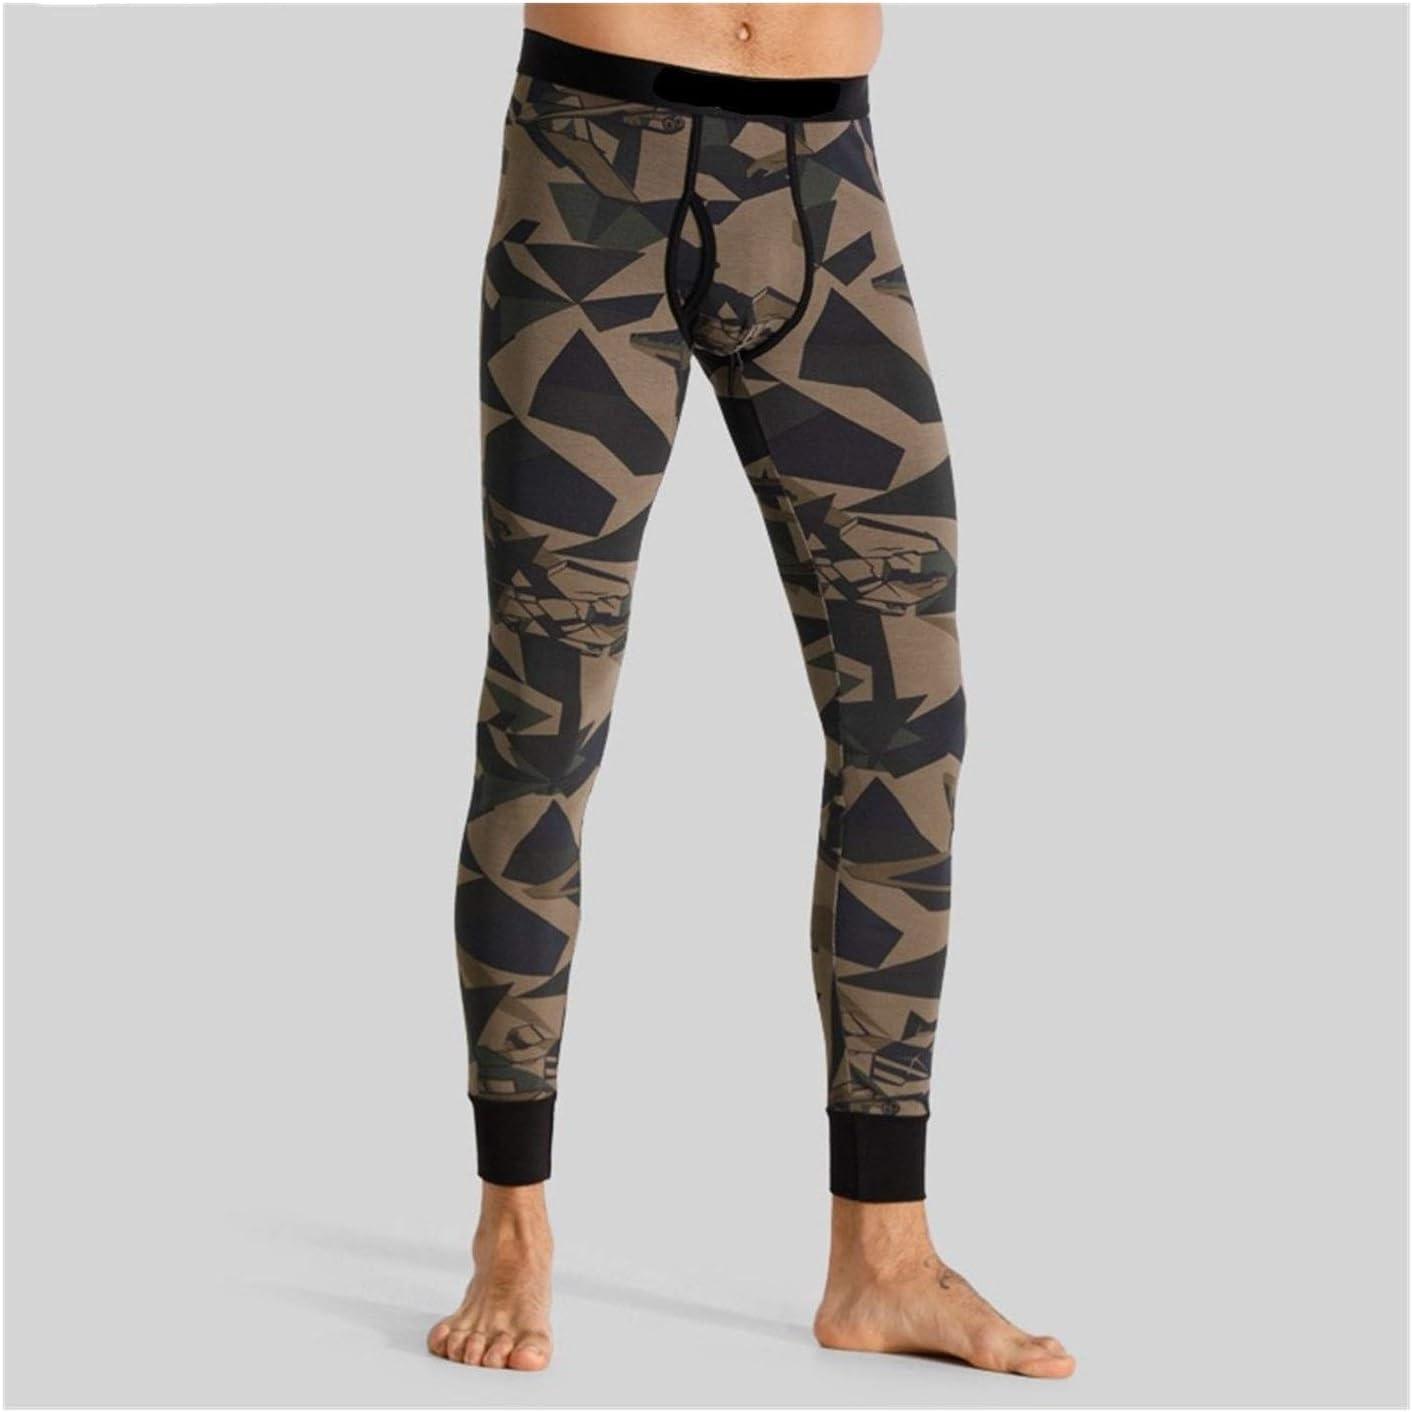 Jinqiuyuan Men Thermal Camouflage Leggings Cotton Soft Comfortable Underwear Eco-Friendly Print Thermal Bottoms Thermo Leggings (Color : Green Camouflage, Size : Large)